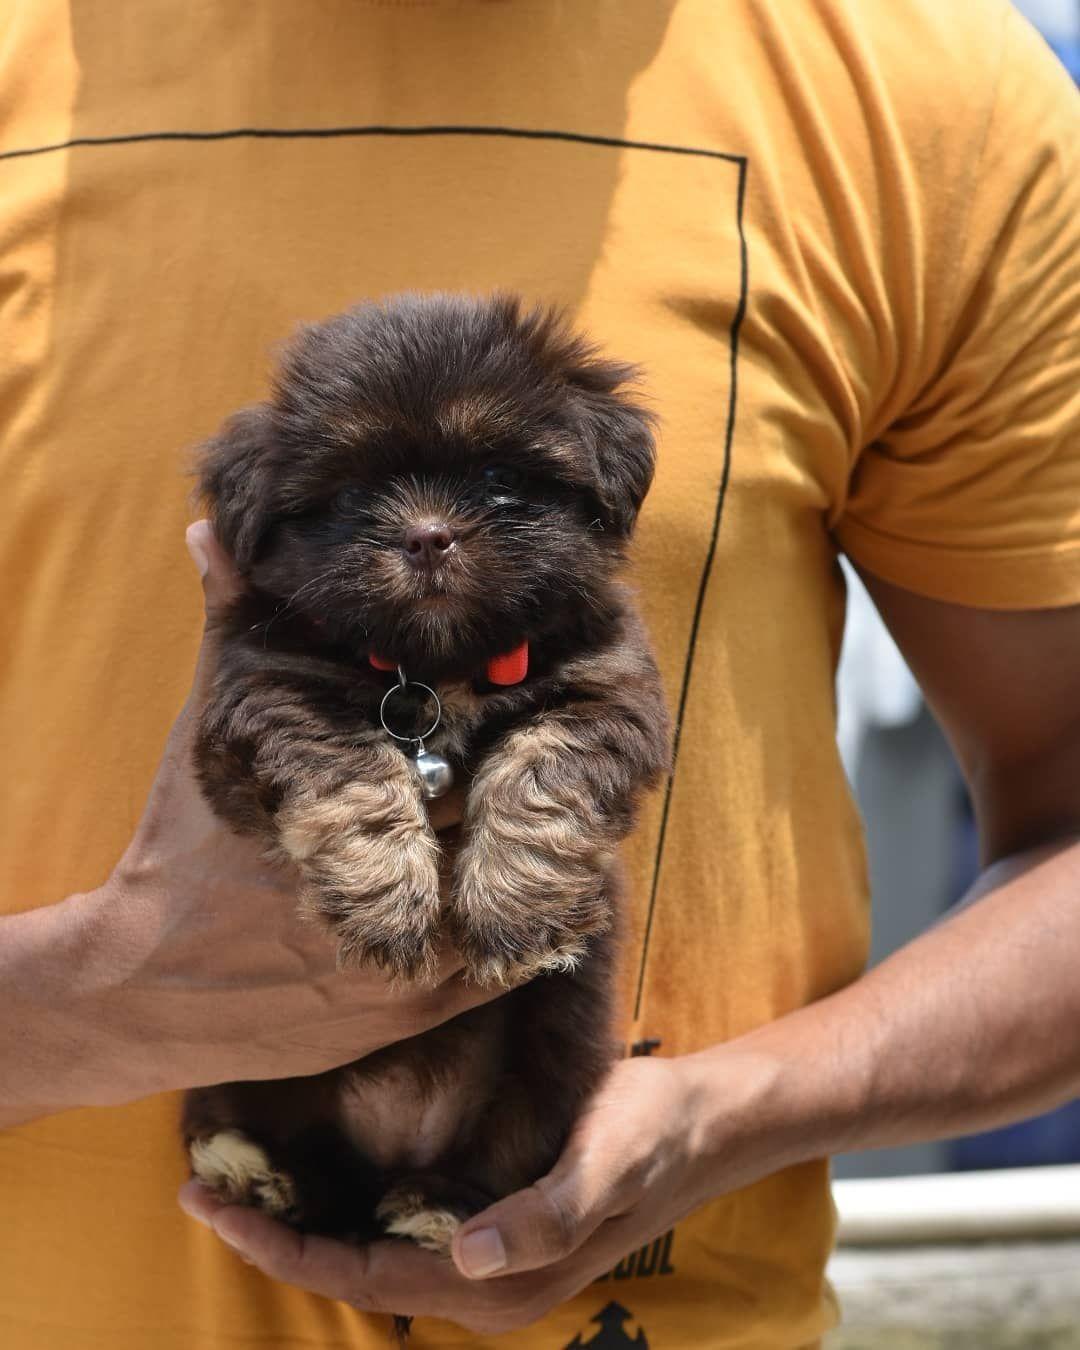 Lhasa Apso Puppies In 2020 Lhasa Apso Puppies Lhasa Apso Pets